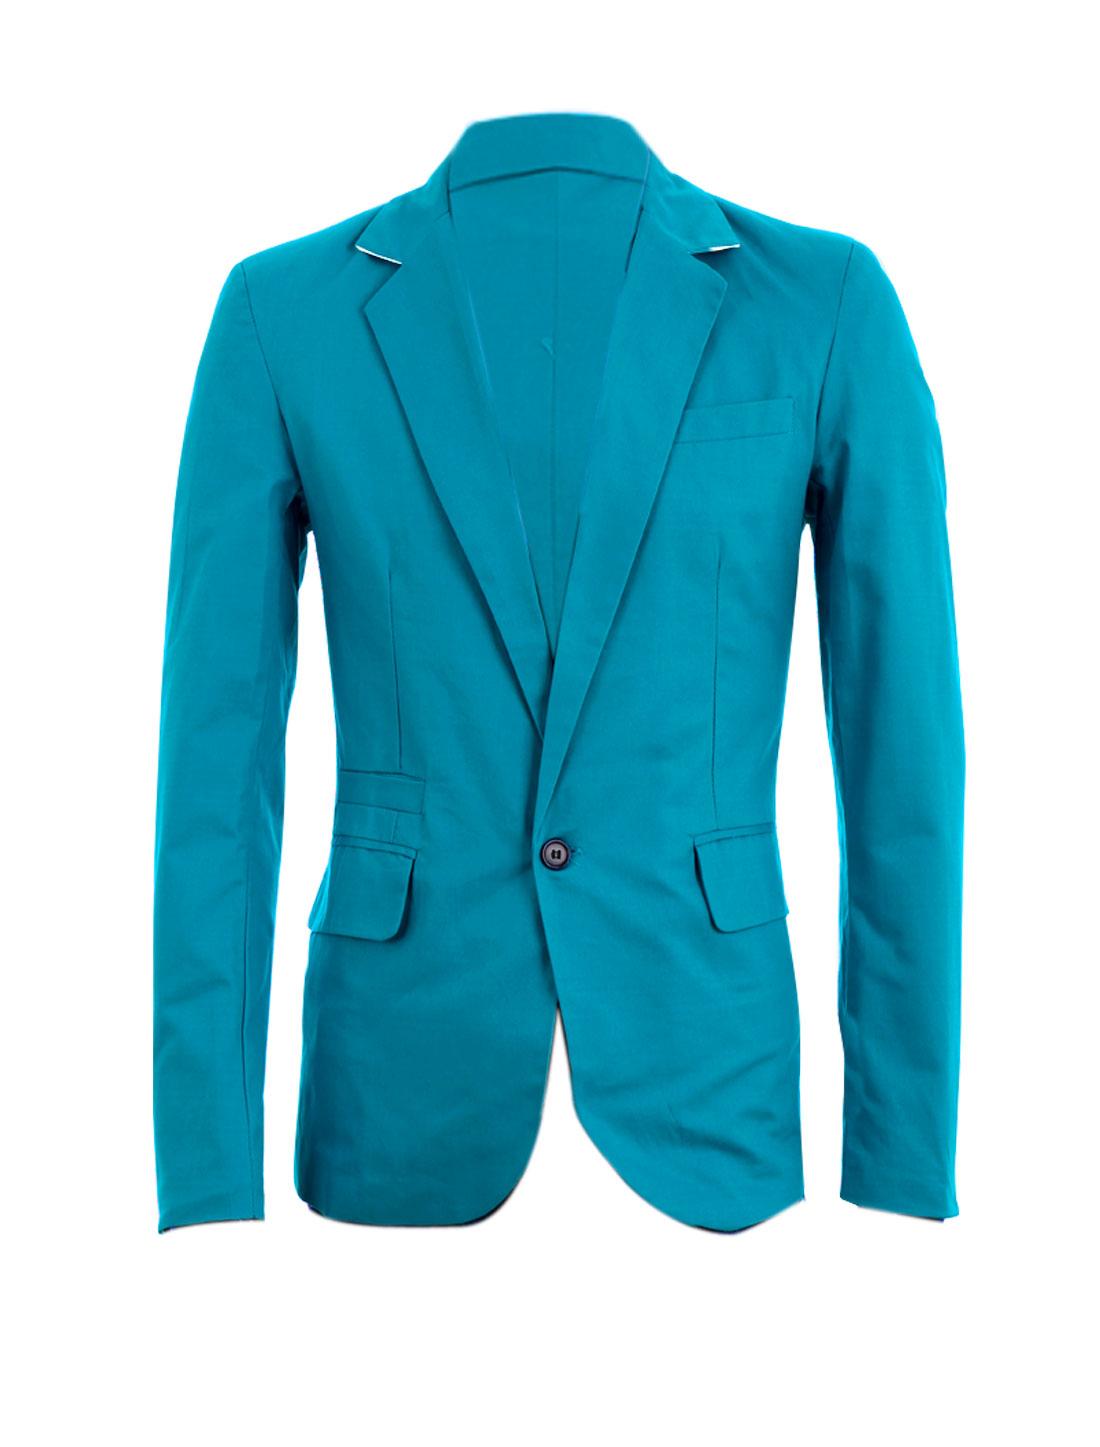 Men One Button Closure Chest Pocket Blazer Turquoise M